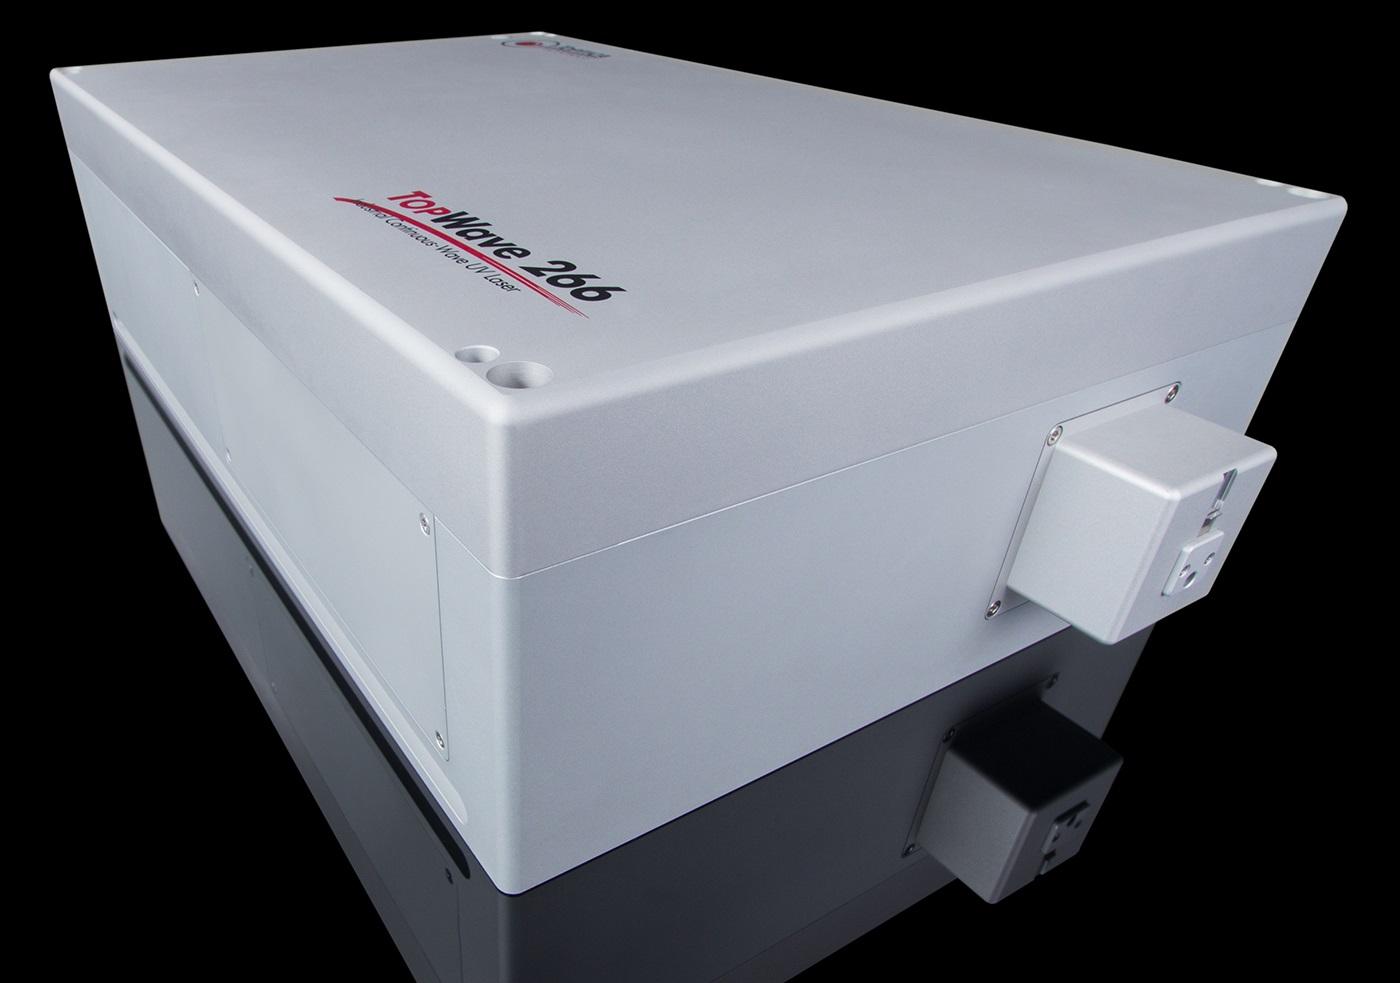 Toptica Presents New Topwave Cw Uv Laser At 266 Nm